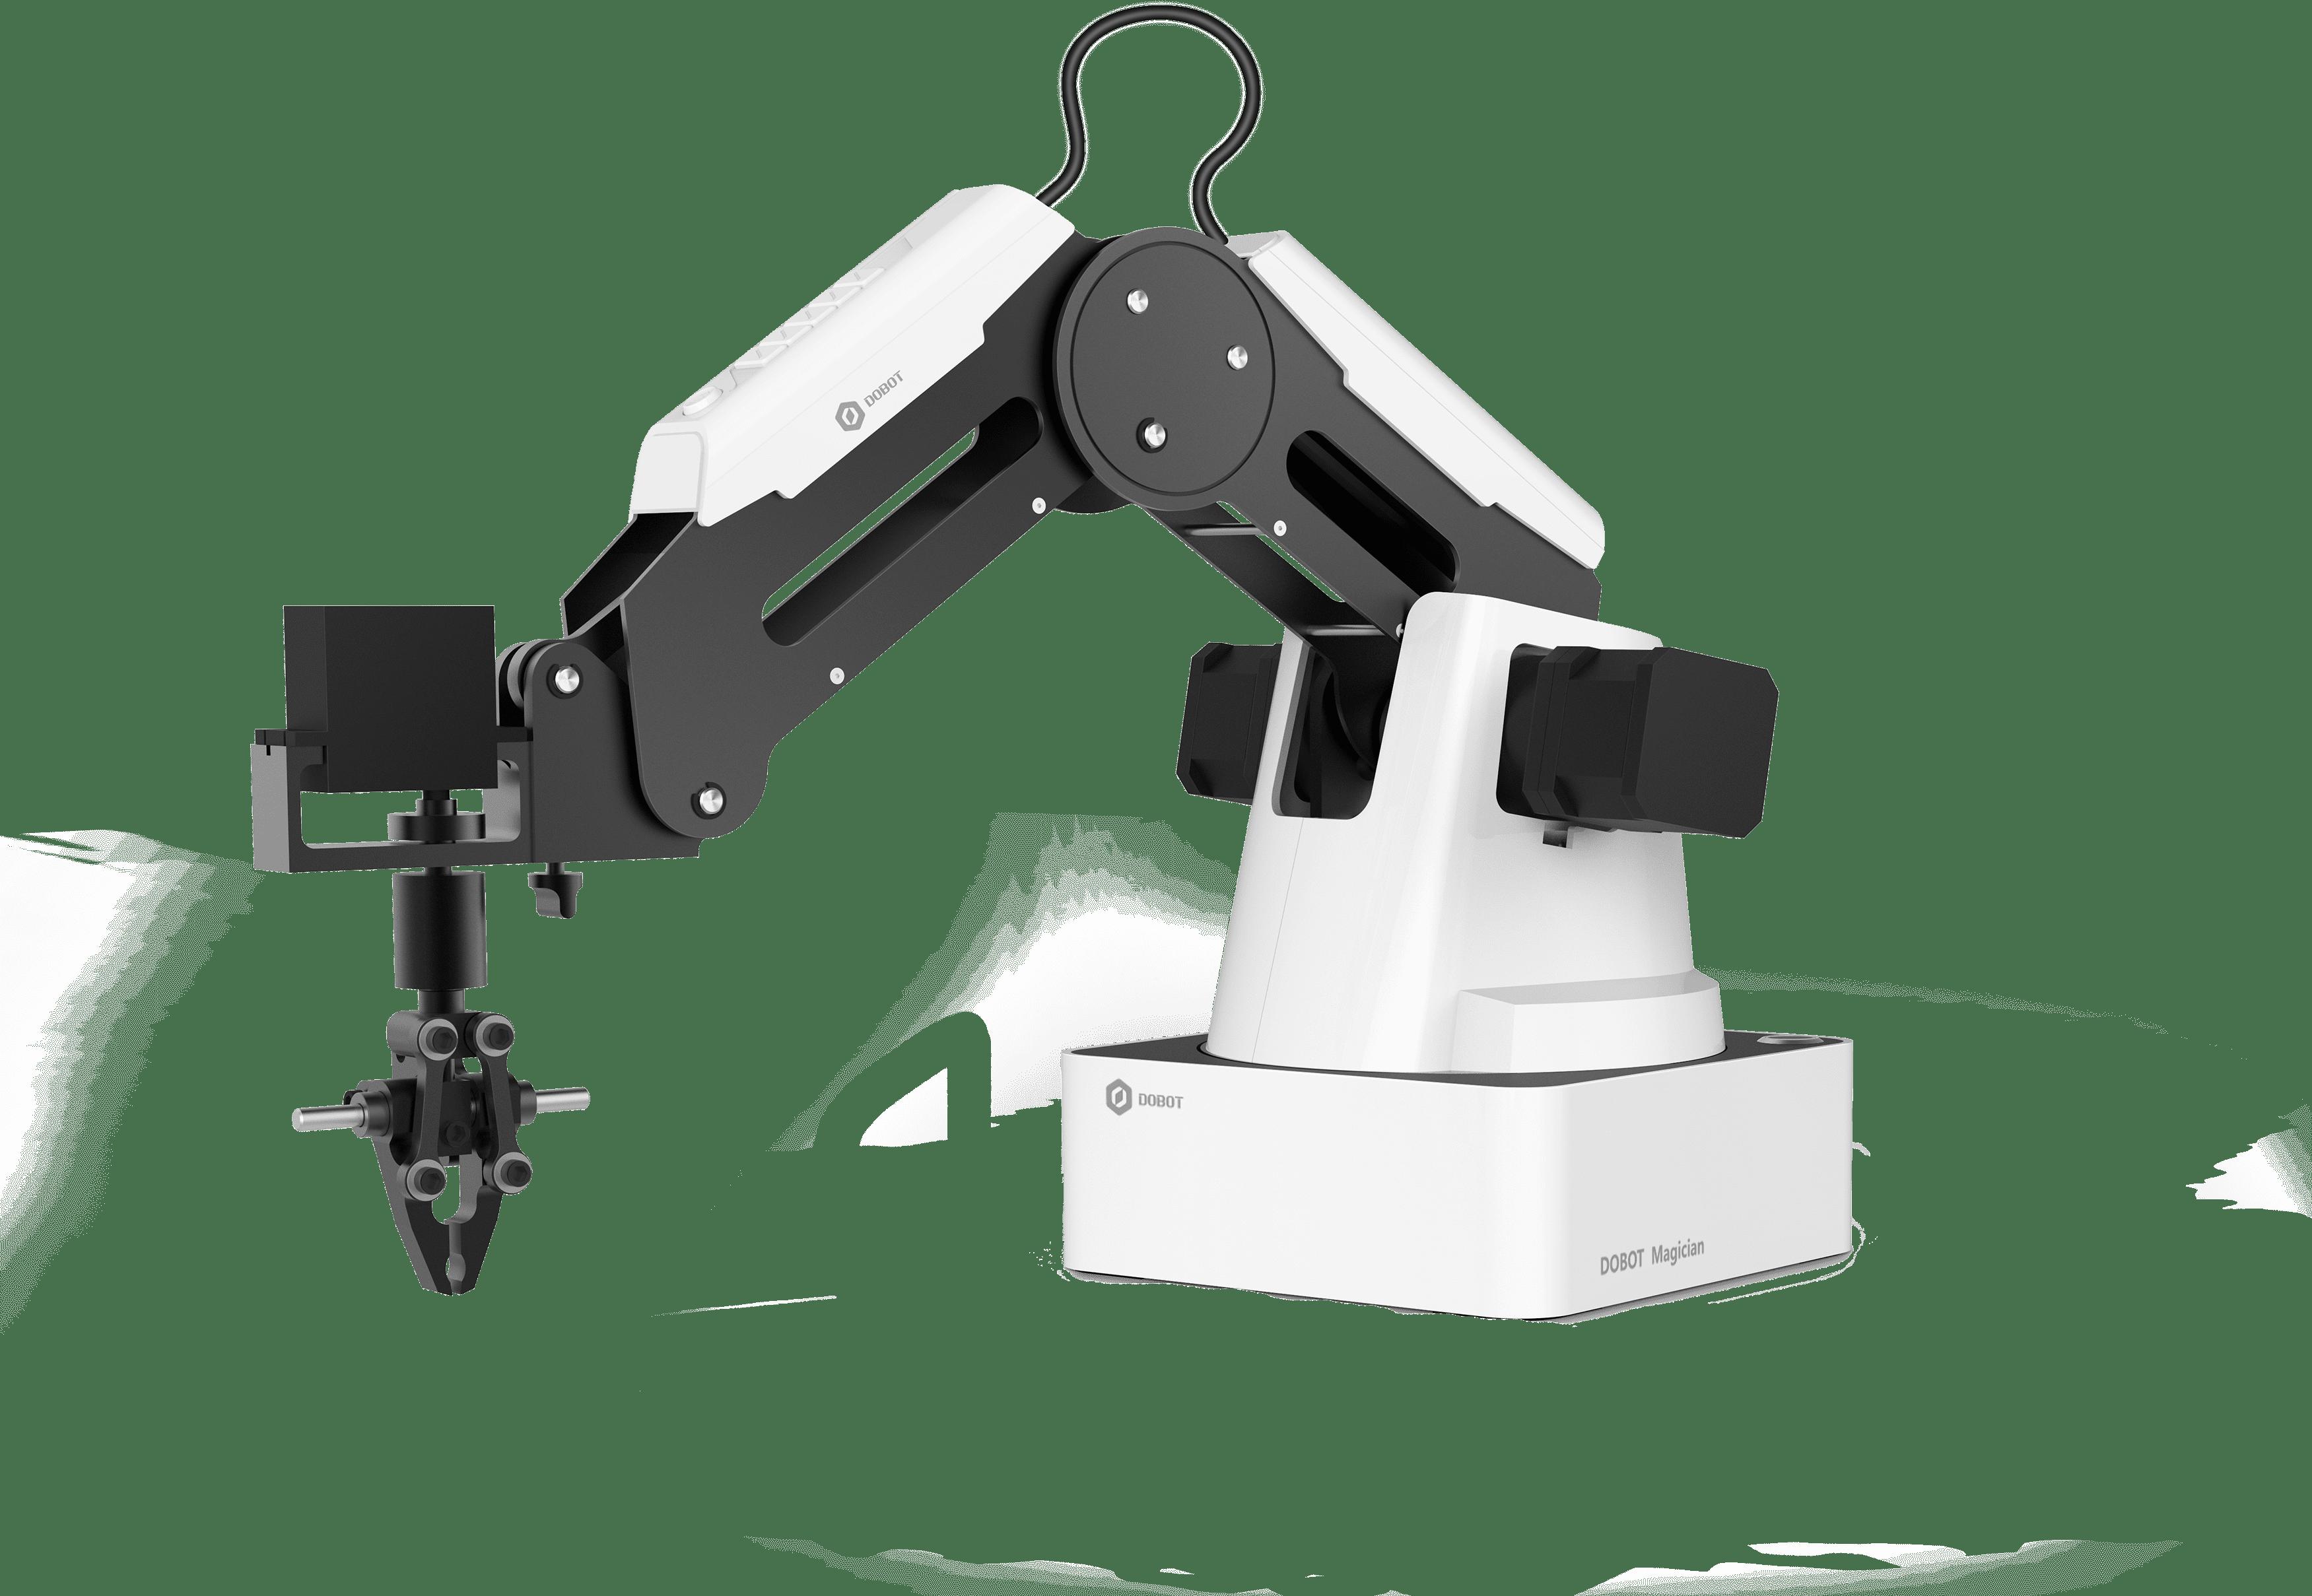 RobotLAB Dobot Robotic Arm-1-2-3 (1) (1)